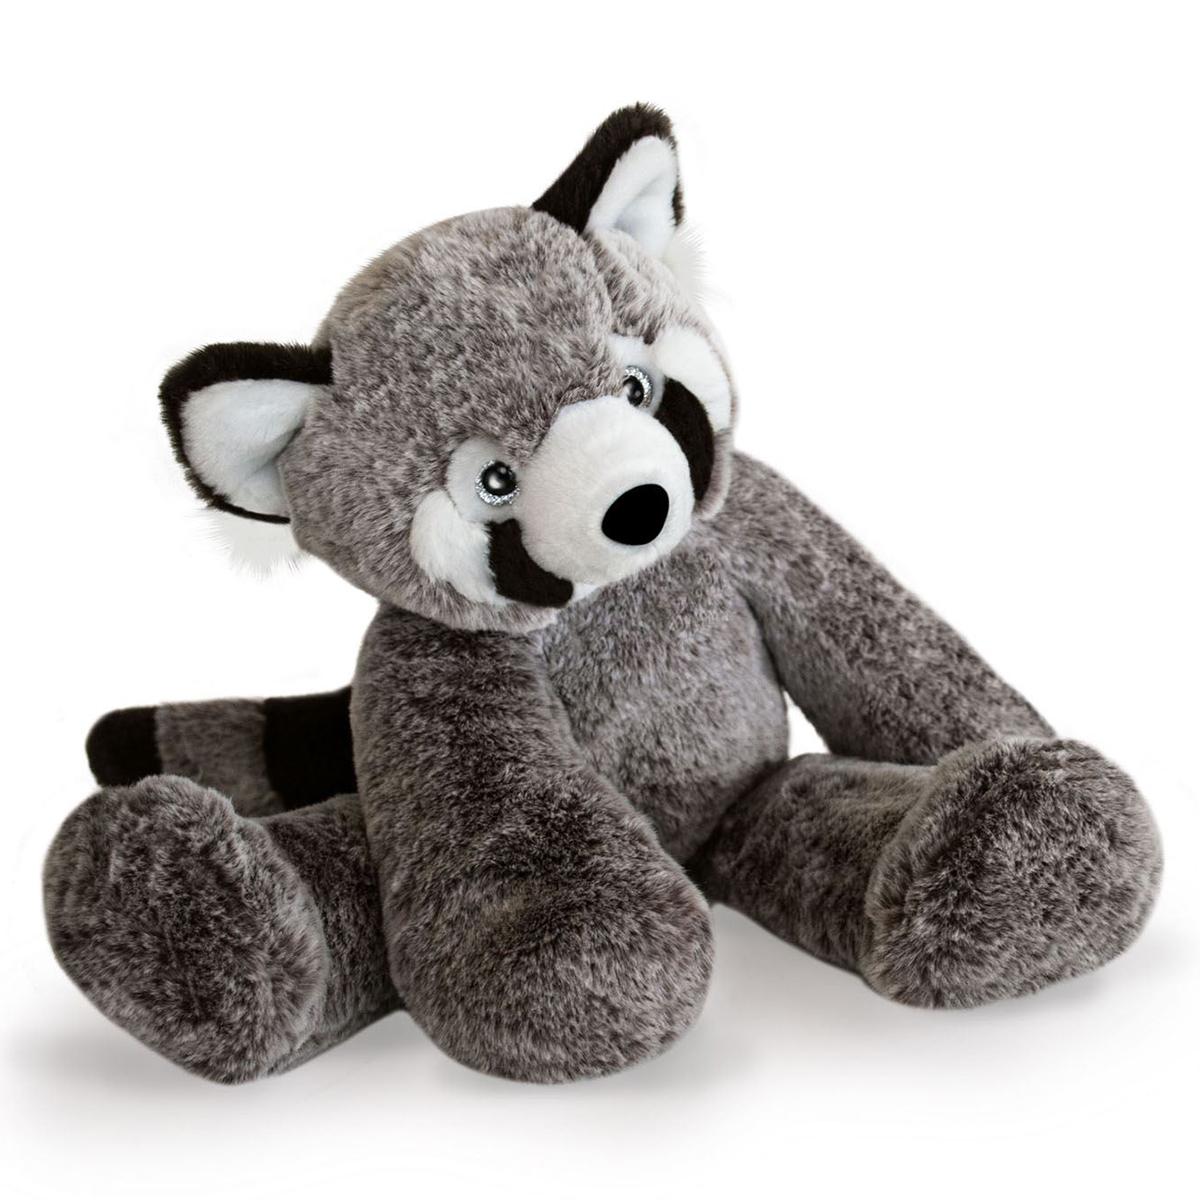 Peluche Peluche Sweety Mousse Panda Roux - Grand Peluche Panda Roux Sweety Mousse 40 cm